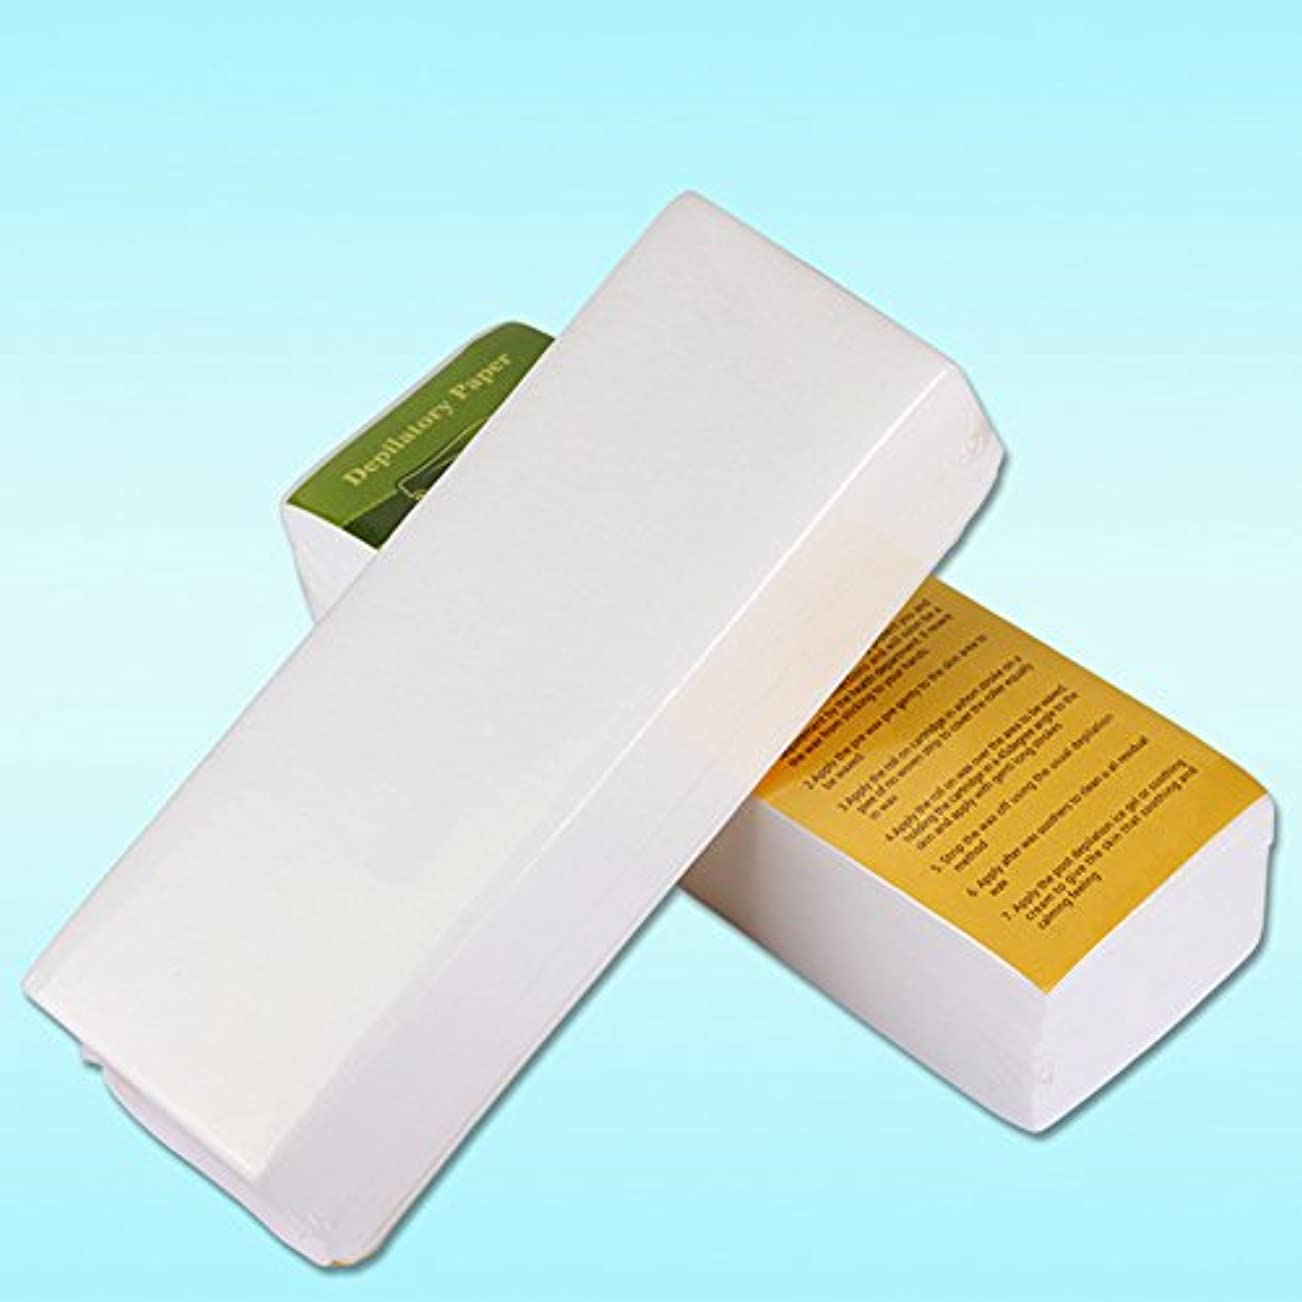 Rabugoo 100個/セット使い捨て不織布ティッシュシェービング脱毛蜜蝋脱毛紙